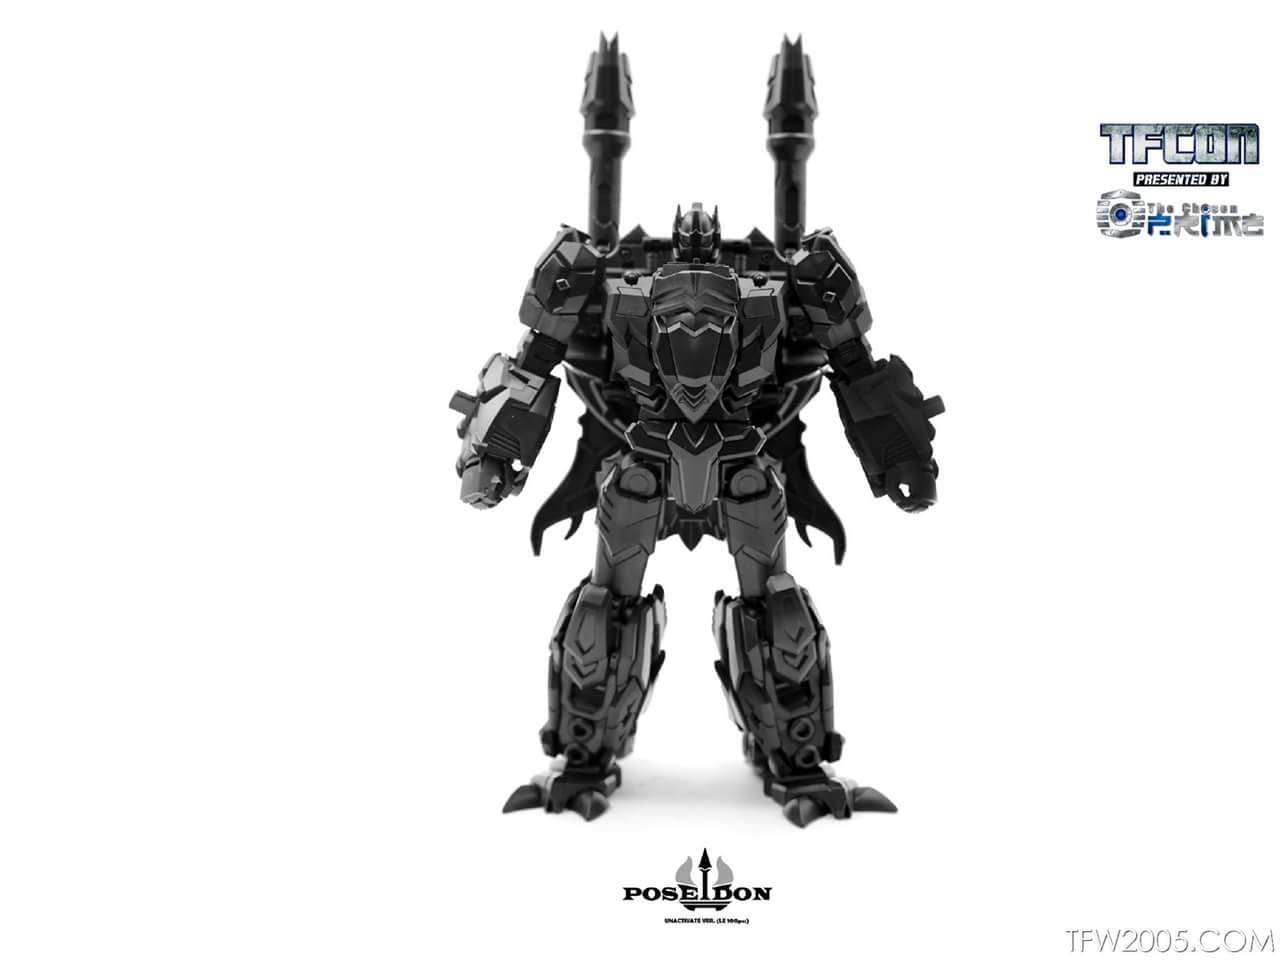 [TFC Toys] Produit Tiers - Jouet Poseidon - aka Piranacon/King Poseidon (TF Masterforce) - Page 6 OX18Nh15_o